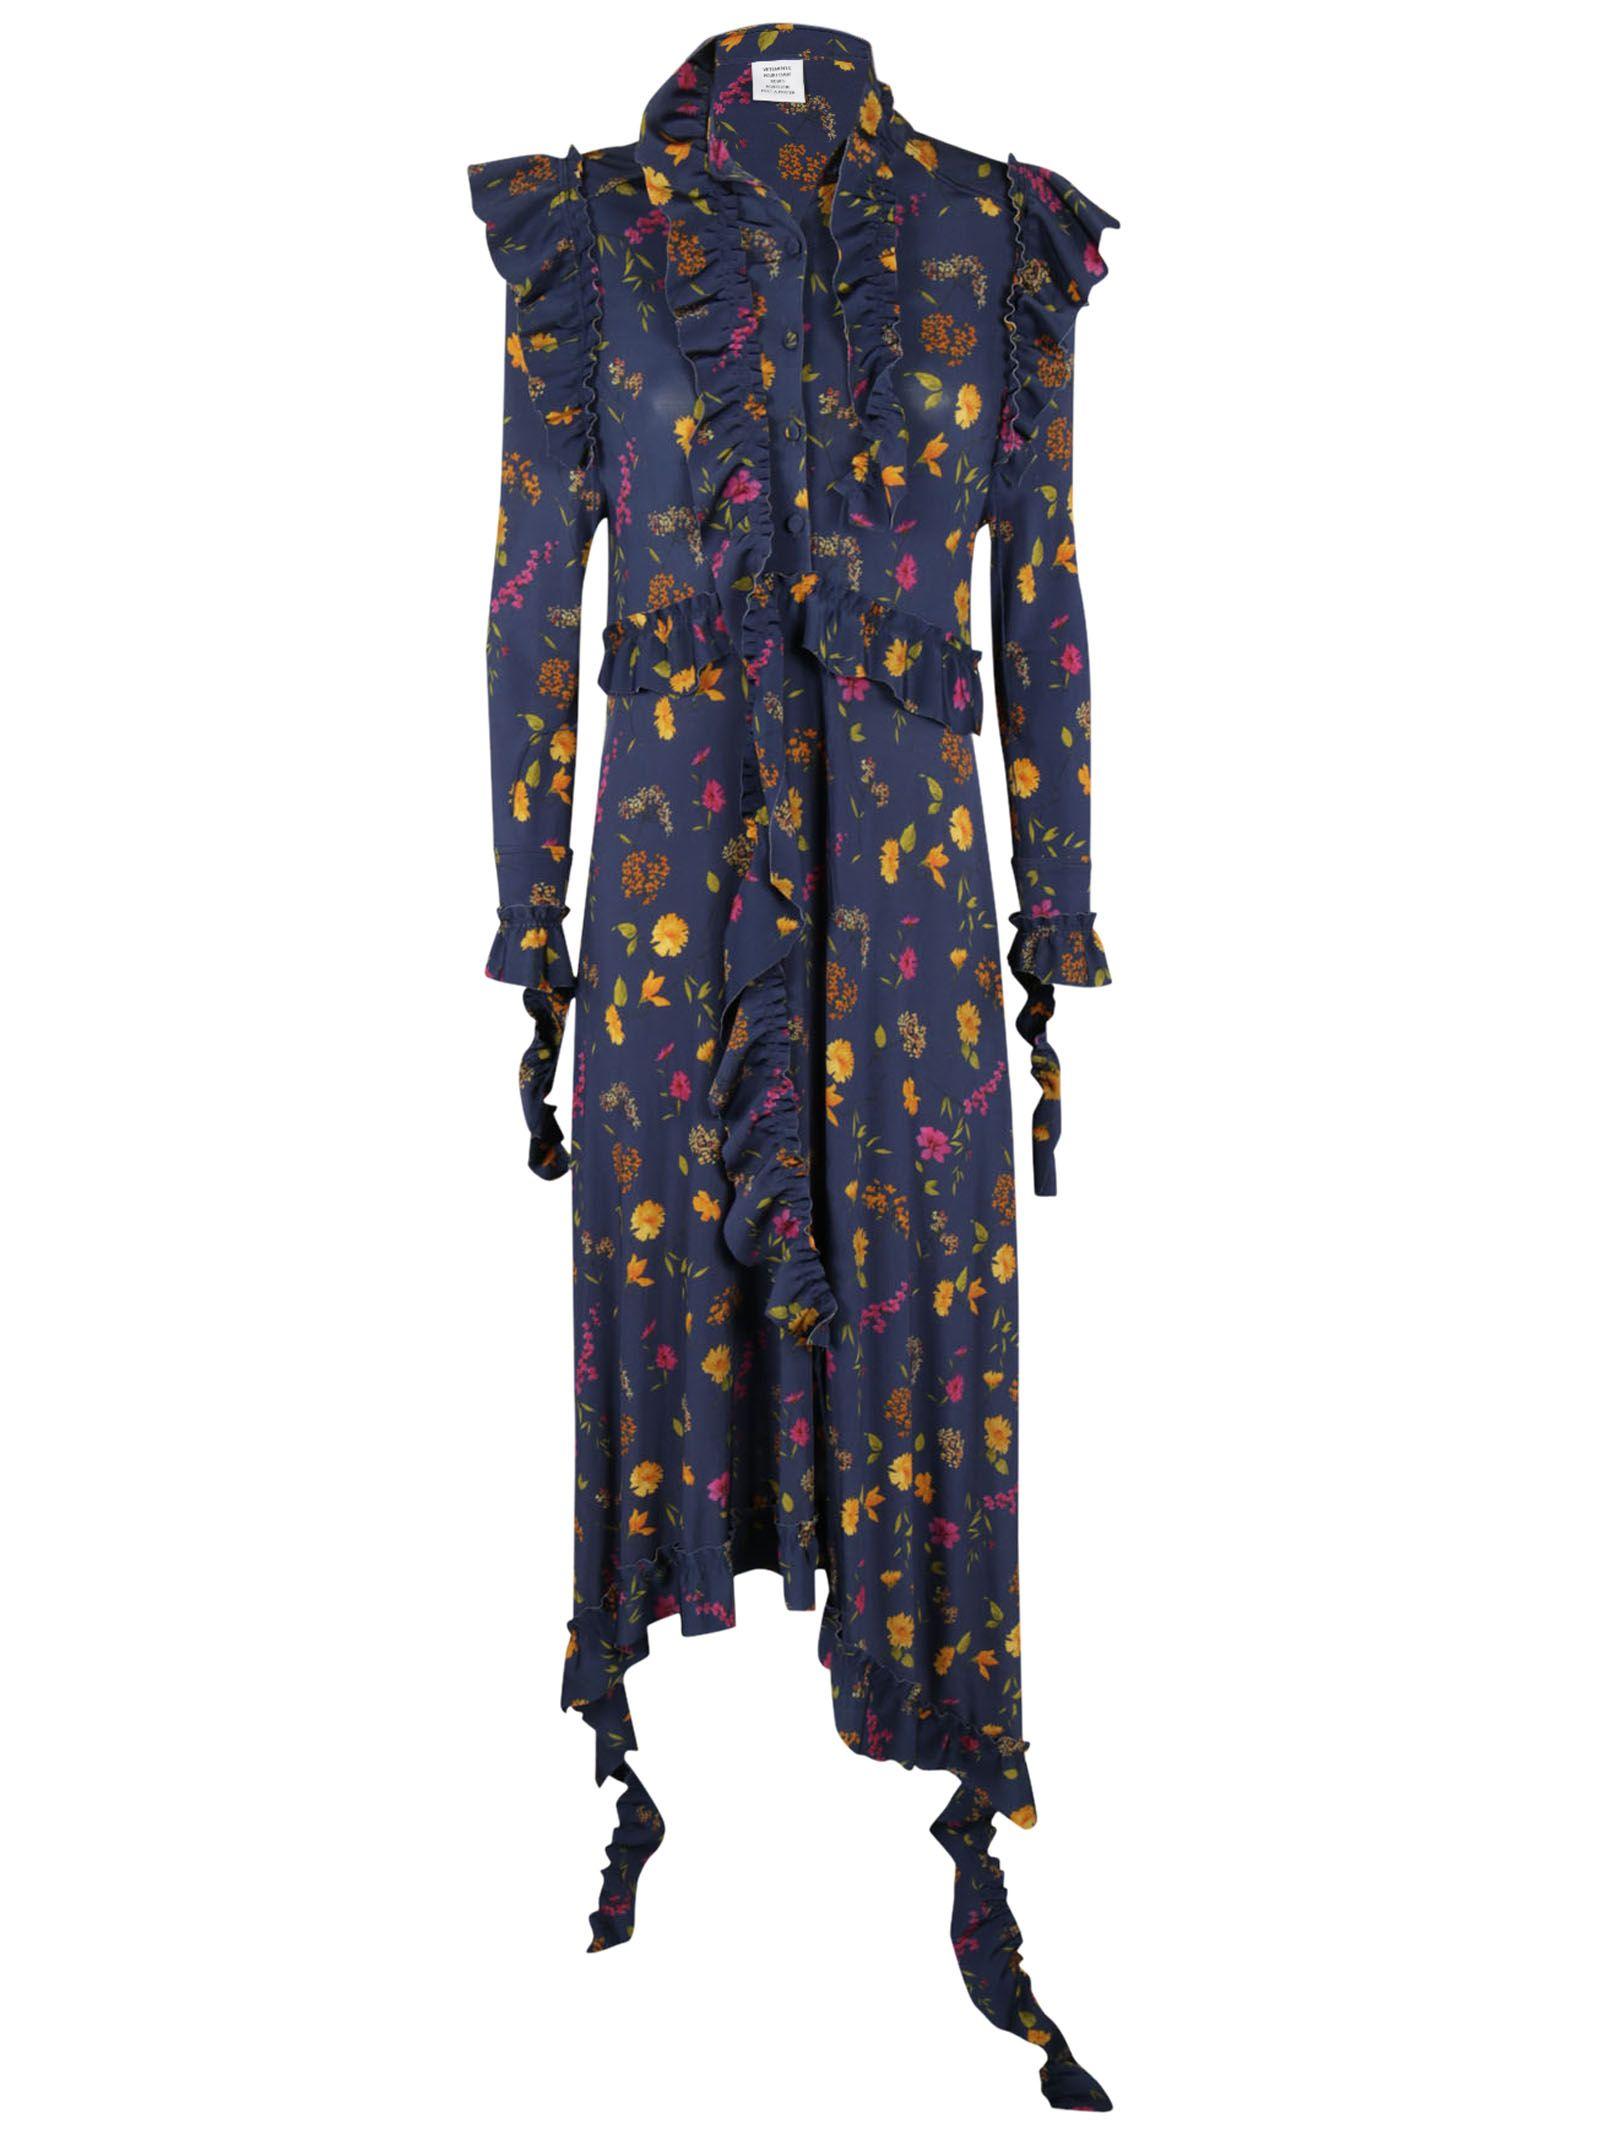 Vetements Floral Print Dress - VETEMENTS - Neri